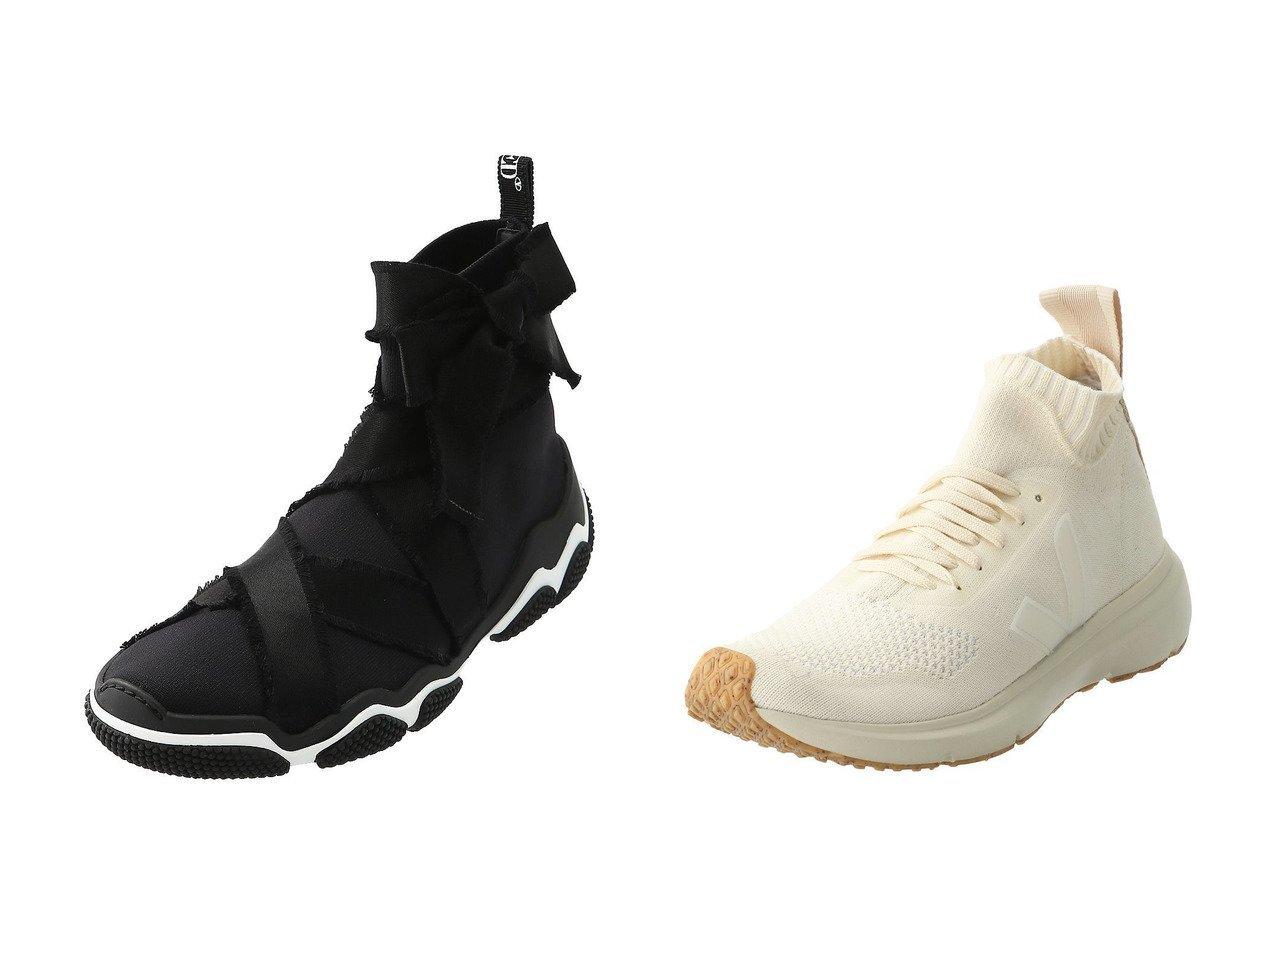 【RED VALENTINO/レッド ヴァレンティノ】のグラムラン スニーカー&【VEJA/ヴェジャ】の【VEJA×Rick Owens】RUNNER STYLE MID スニーカー シューズ・靴のおすすめ!人気、レディースファッションの通販  おすすめで人気のファッション通販商品 インテリア・家具・キッズファッション・メンズファッション・レディースファッション・服の通販 founy(ファニー) https://founy.com/ ファッション Fashion レディース WOMEN スニーカー スポーティ フィット リボン |ID:crp329100000000103